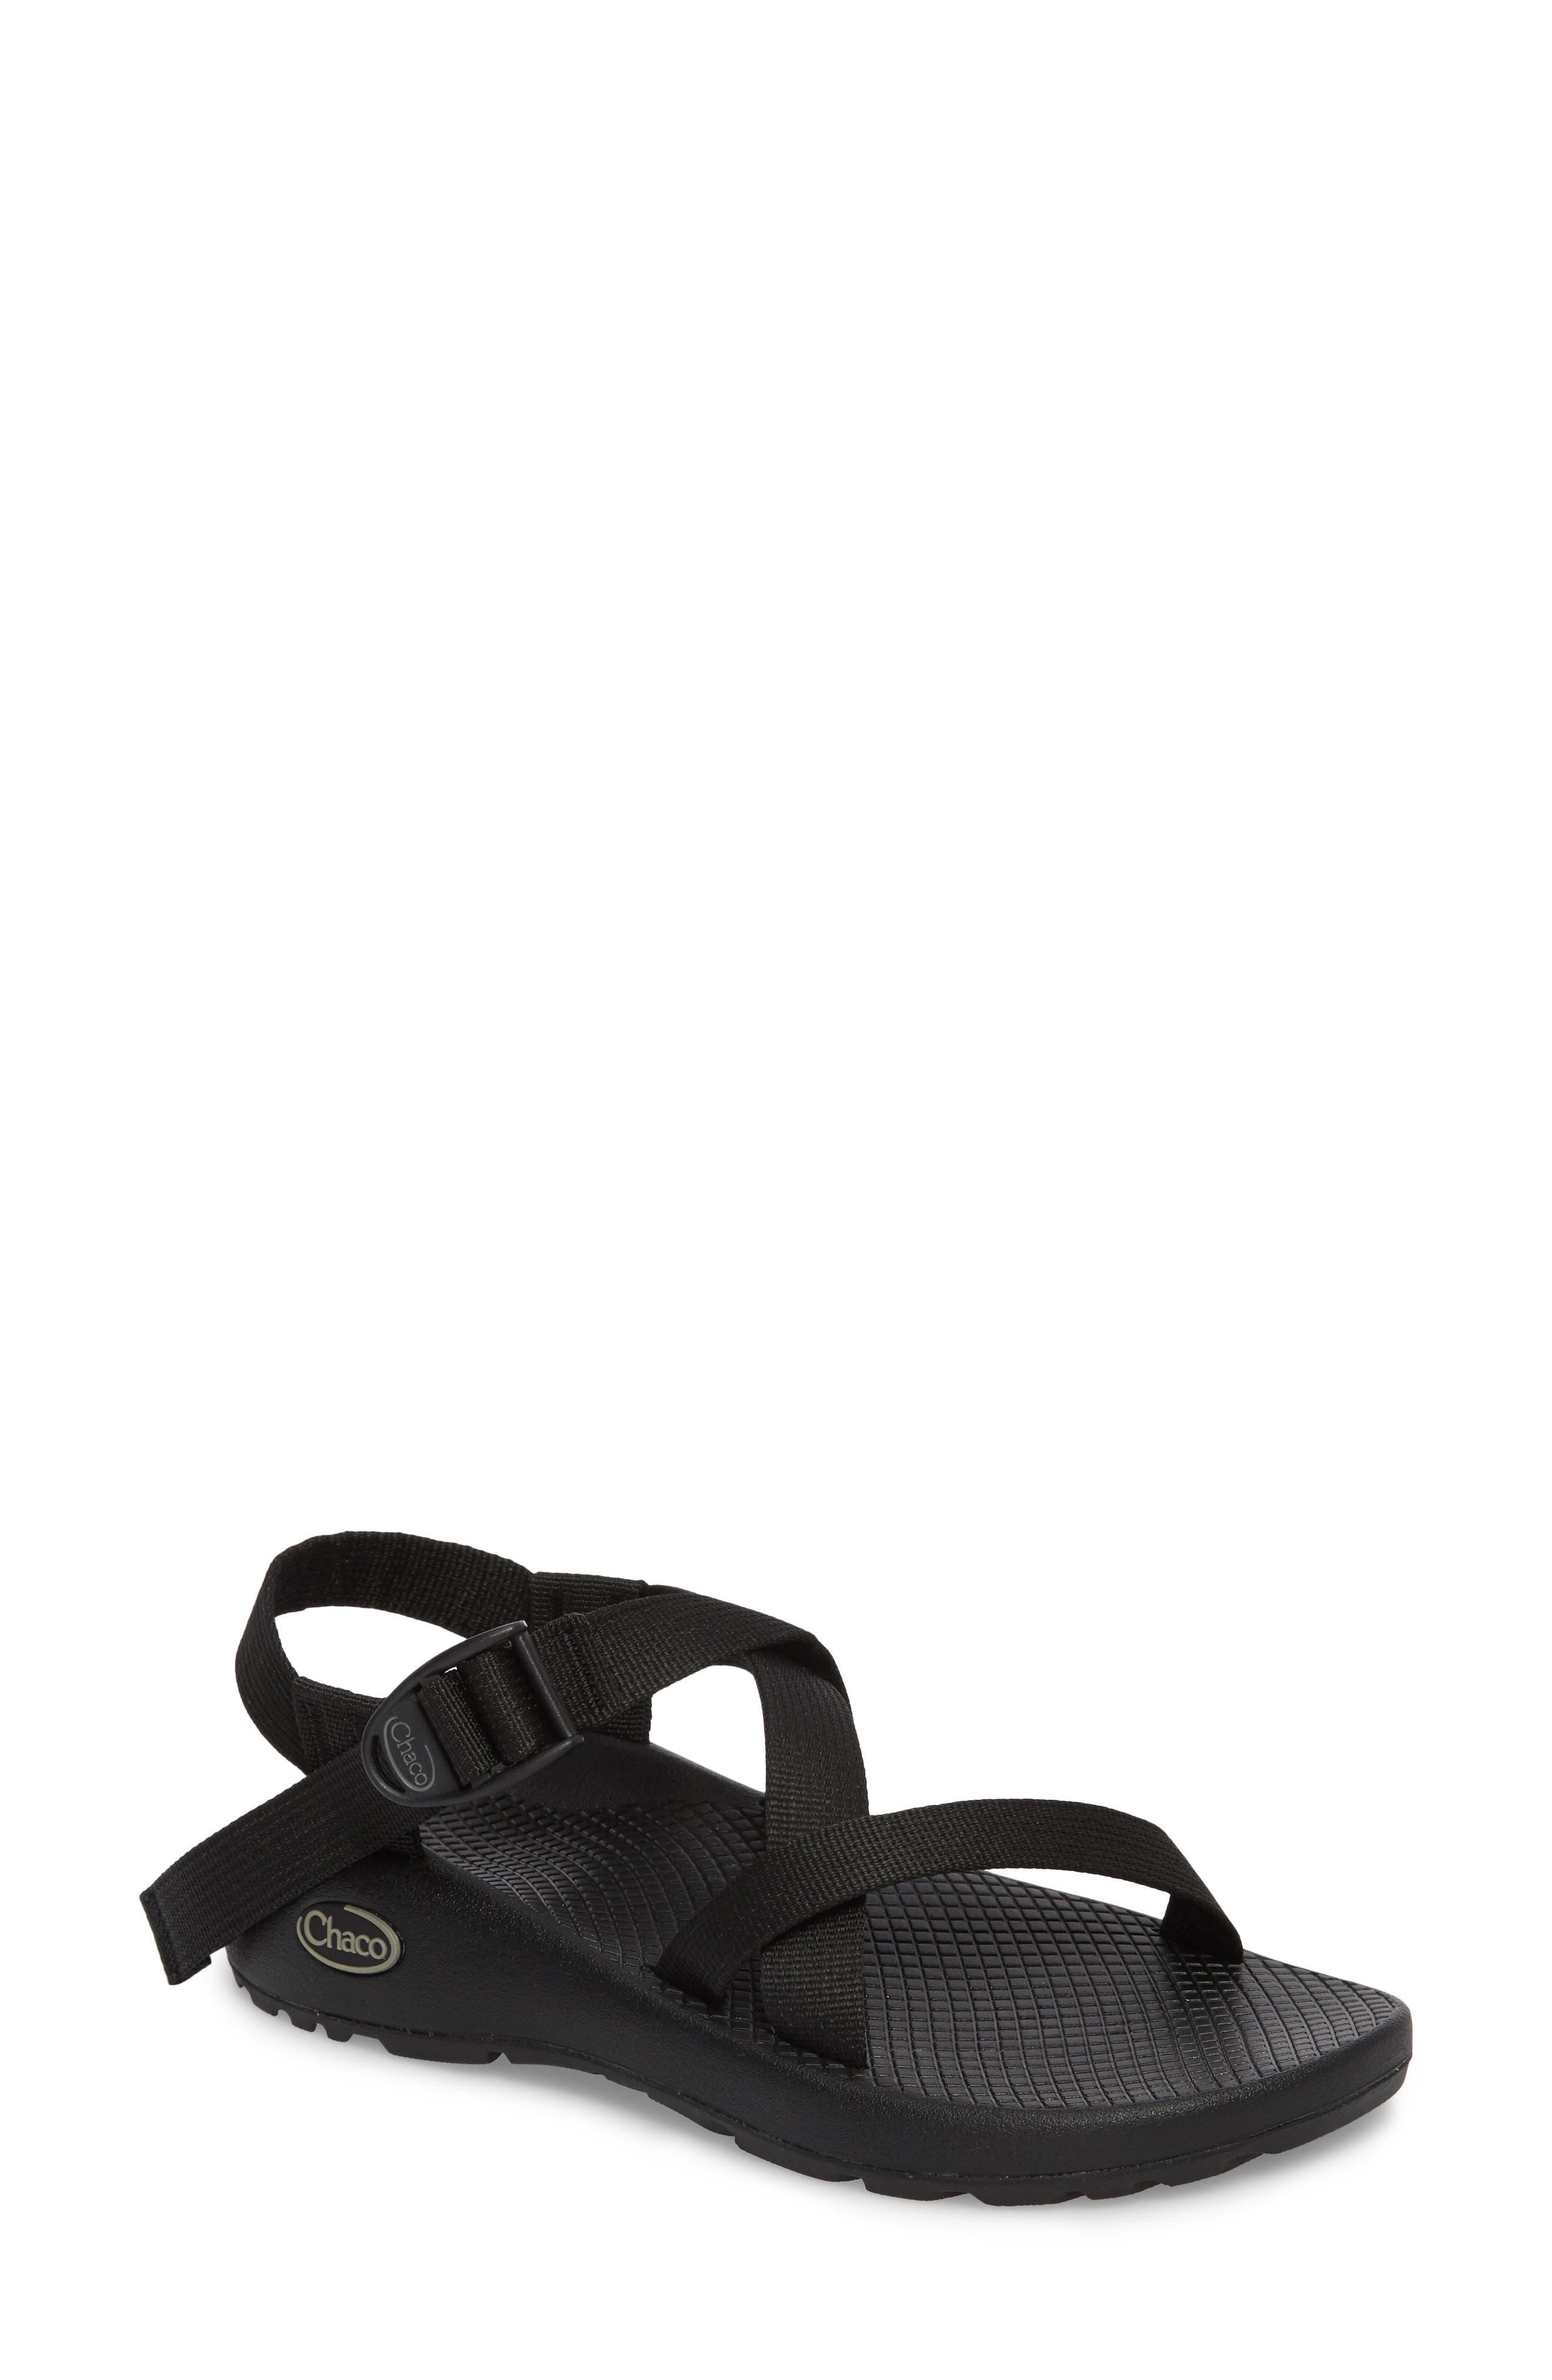 Main Image - Chaco Z/1 Classic Sport Sandal (Women)